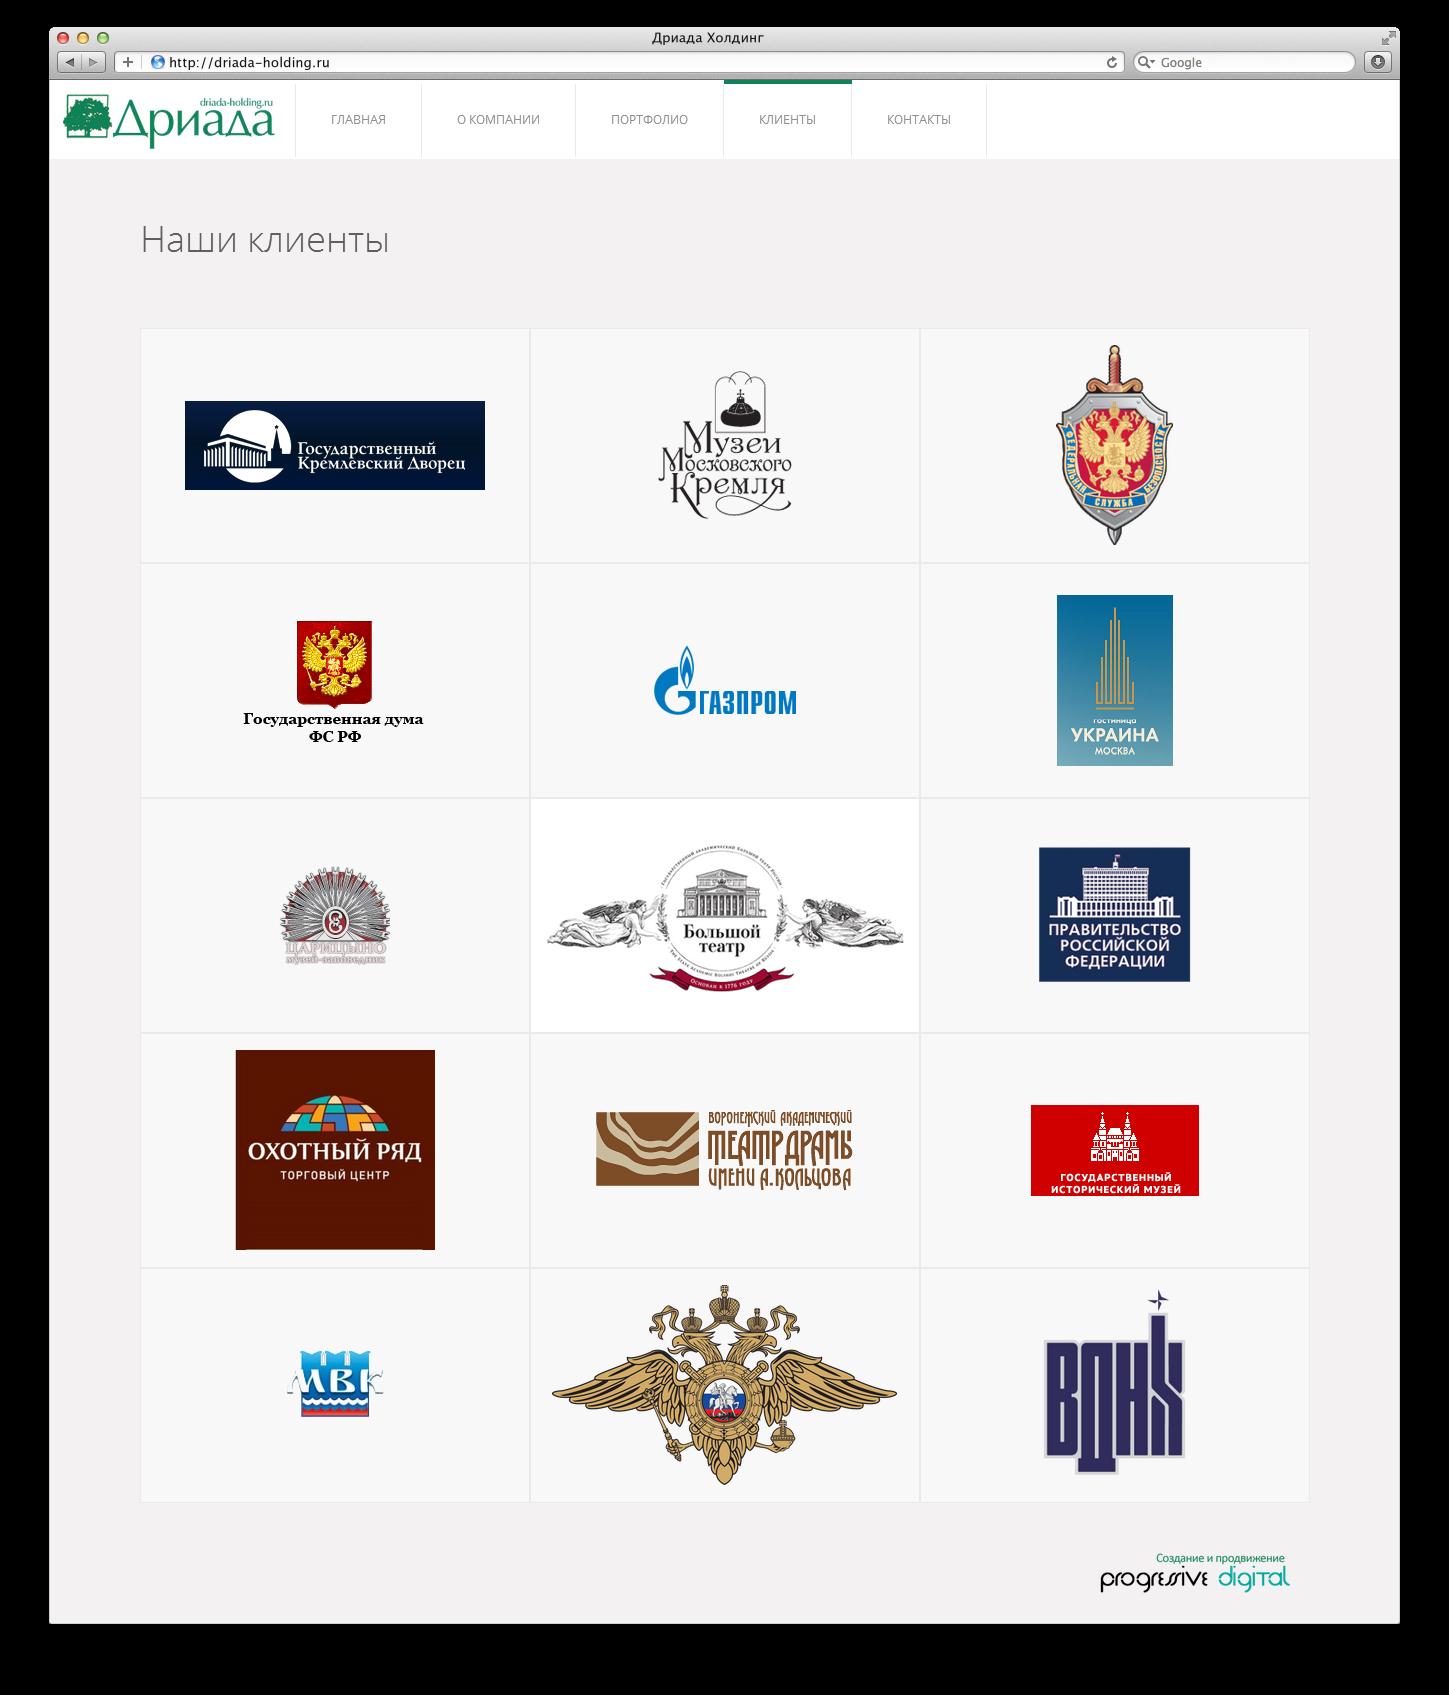 Driada-holding.ru (корпоративный сайт, Wordpress)